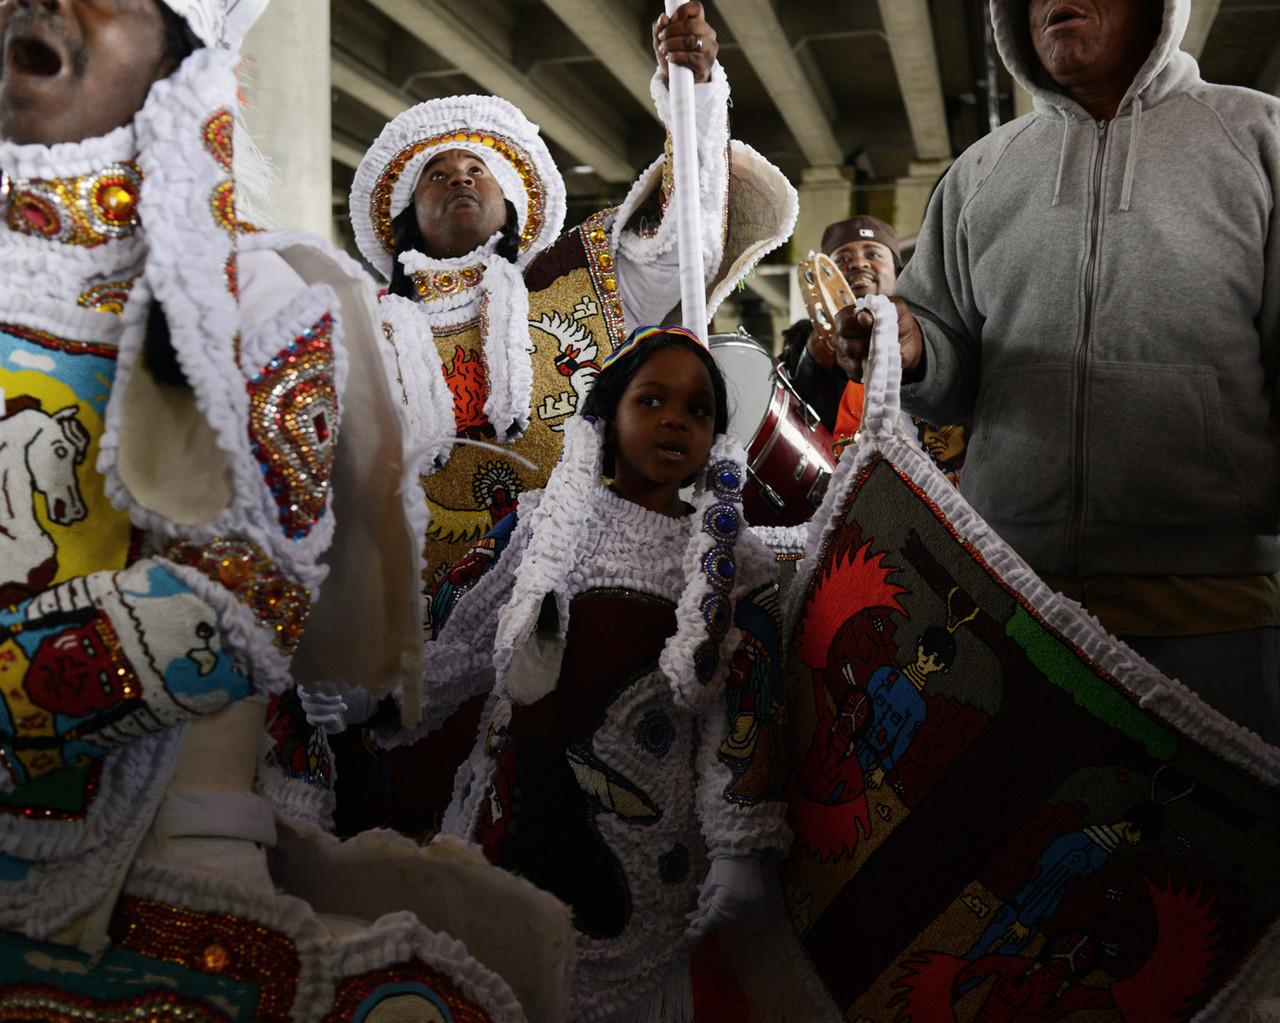 native american influences on modern u s culture essay Free native american culture essays and papers helpme  native american  influences on modern u s culture essay native american influences on modern  u s.